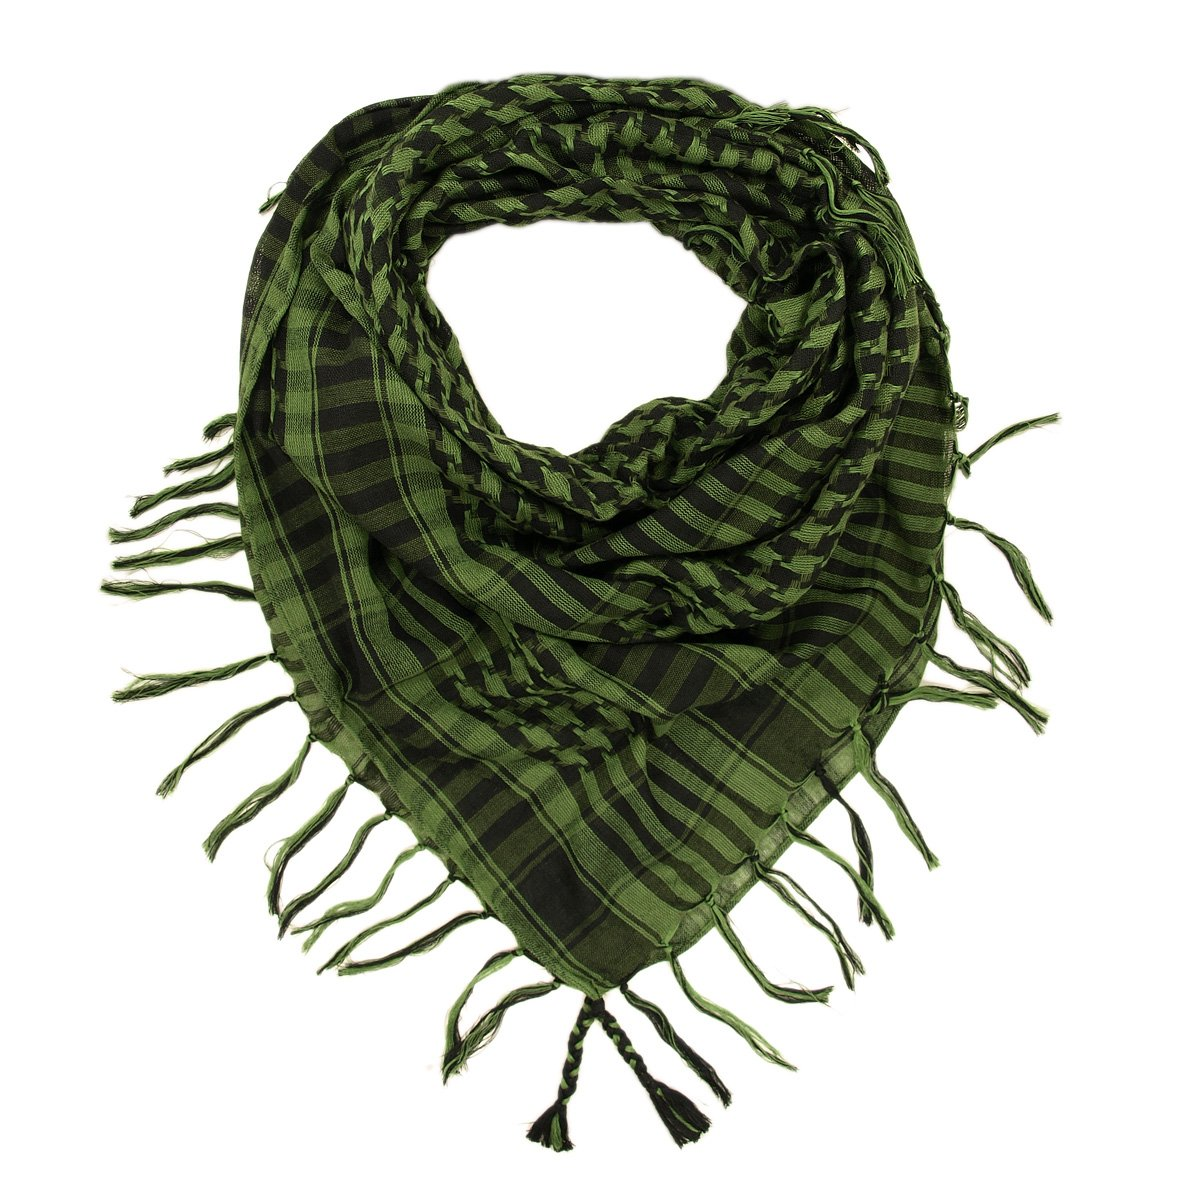 Kuldip Unisex Chequered Arab Arafat Shemagh Kafiyah Desert Style Scarf Throw SC81183B-Gray